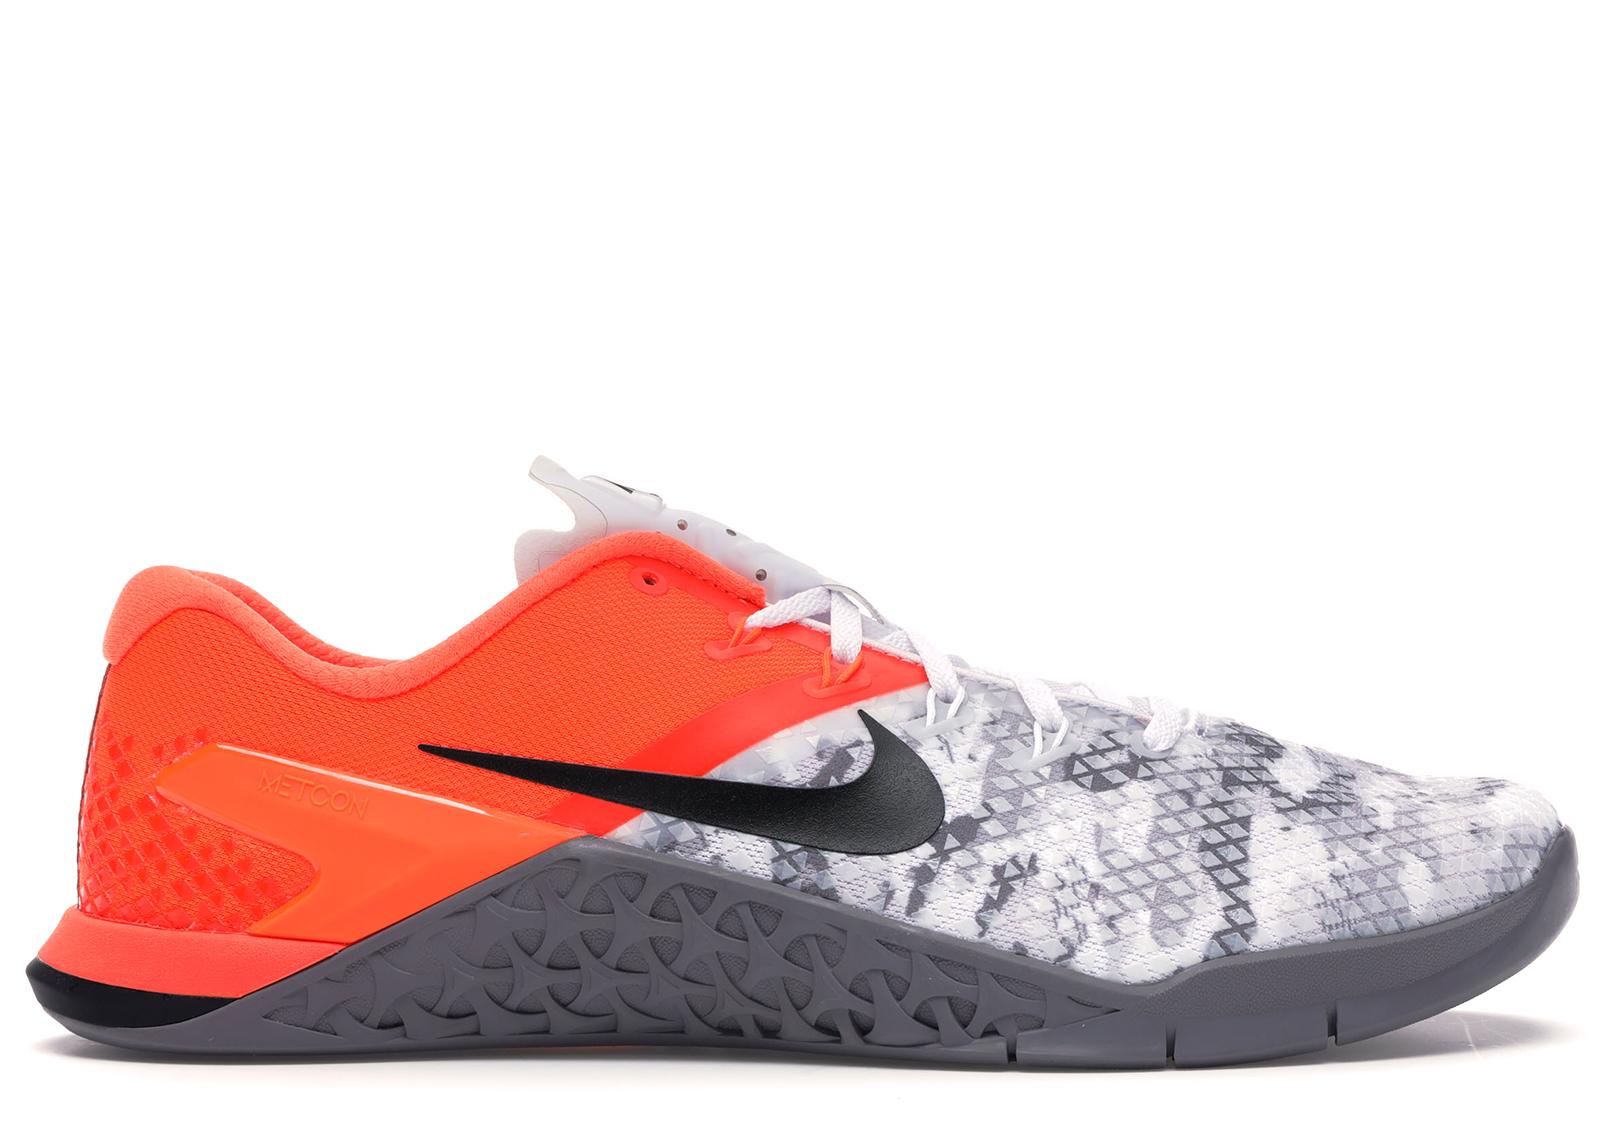 Nike Metcon 4 XD Hyper Crimson Black